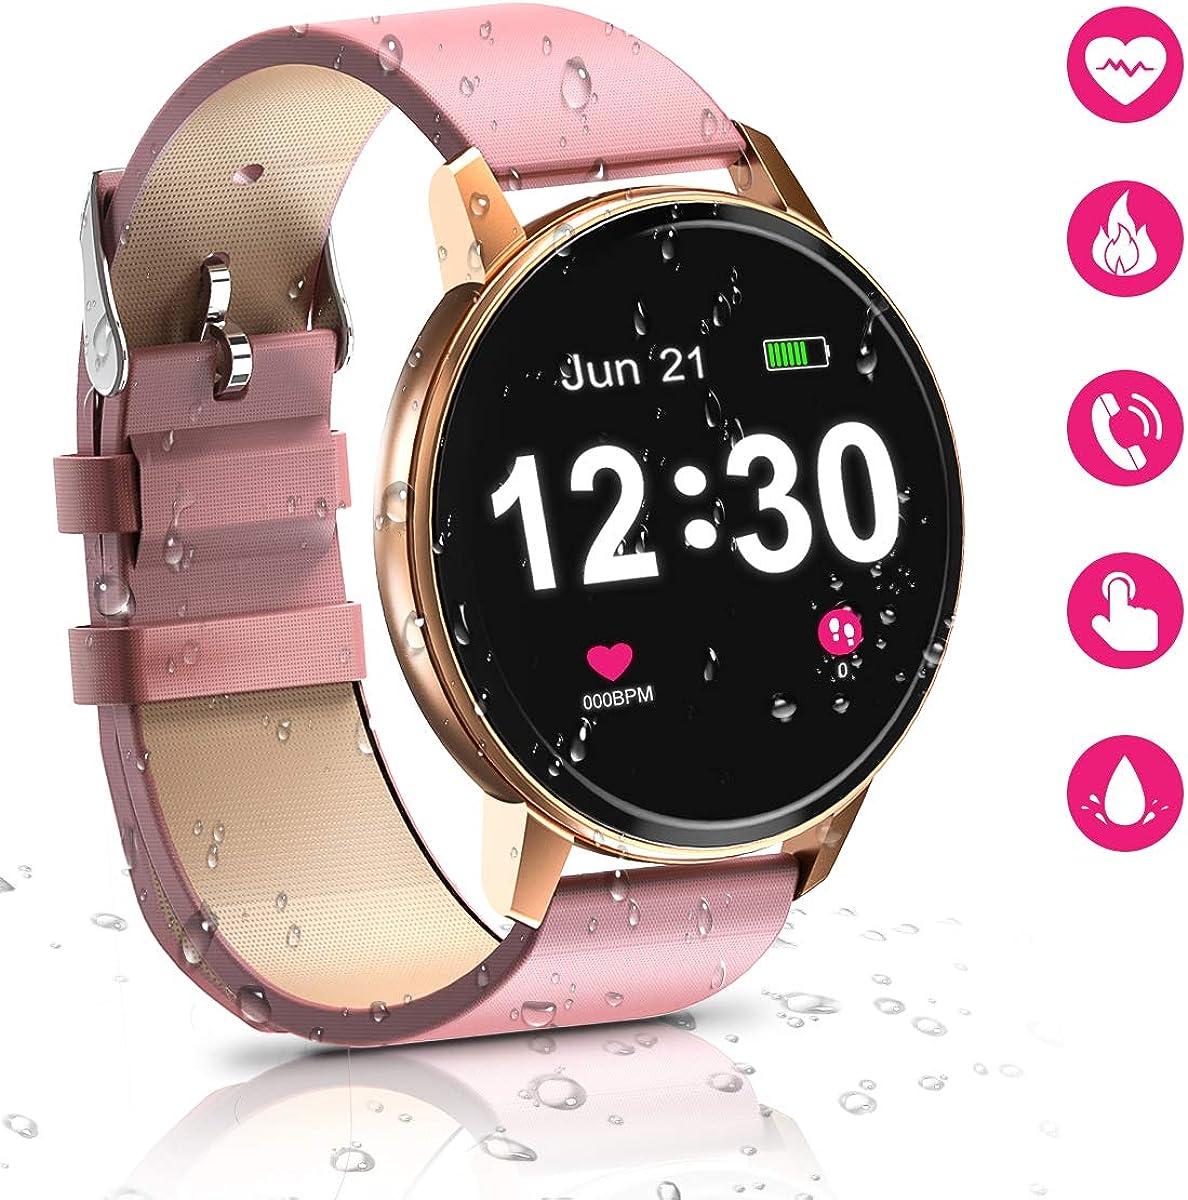 Reloj Inteligente Bluetooth para Mujeres, IP68 a Prueba de Agua con Pantalla táctil Completa de, Monitor de Ritmo cardíaco, podómetro de Seguimiento de Actividad para Android e iOS